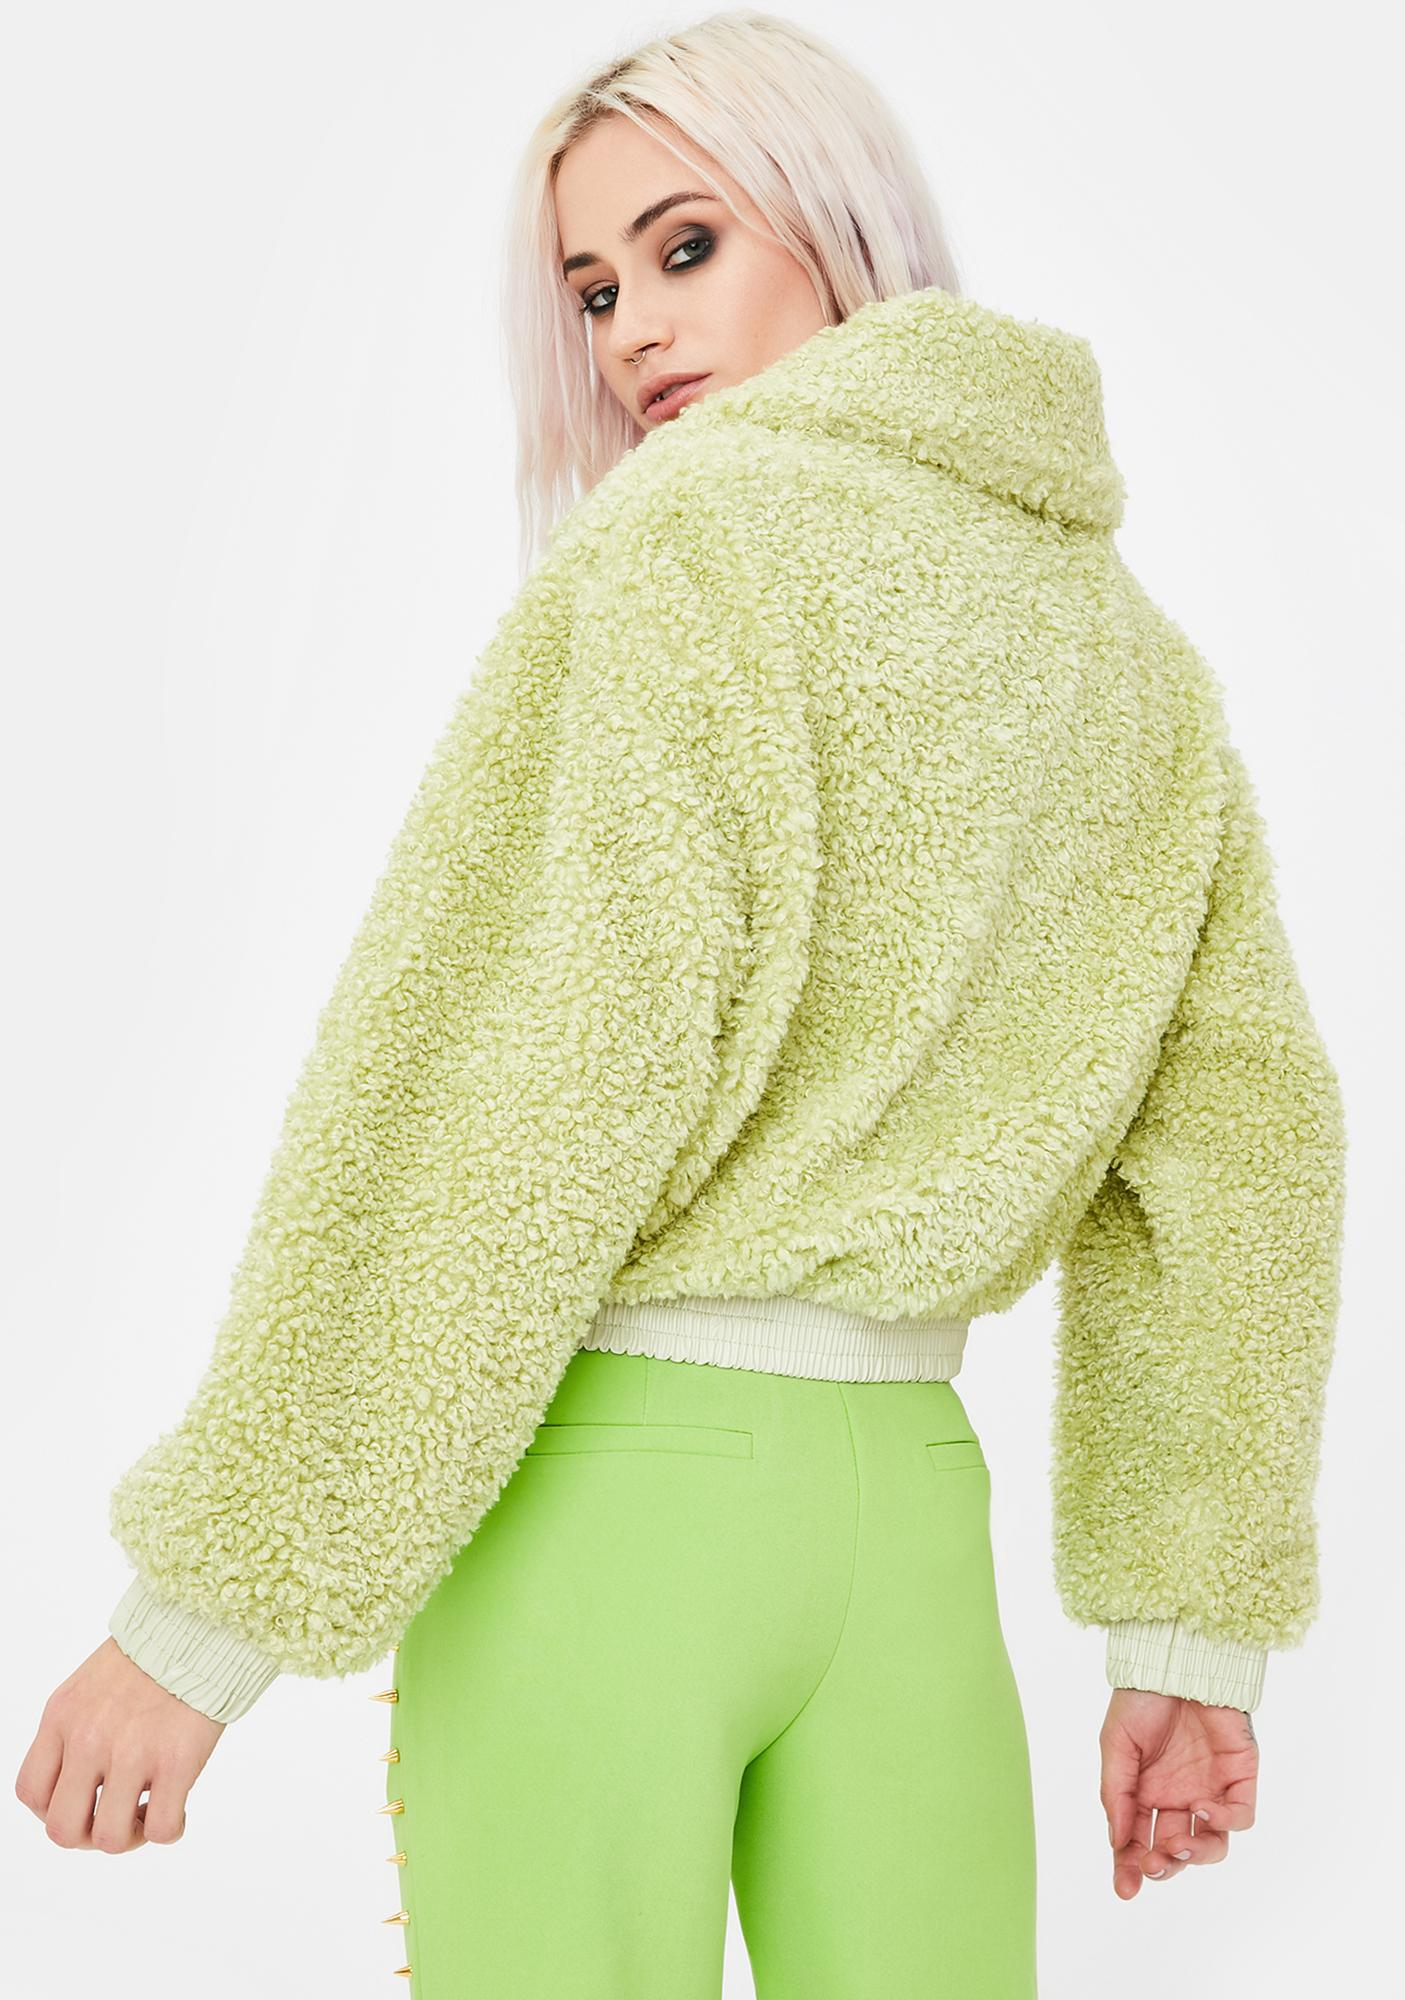 No Dress Avocado Green Faux Fur Jacket